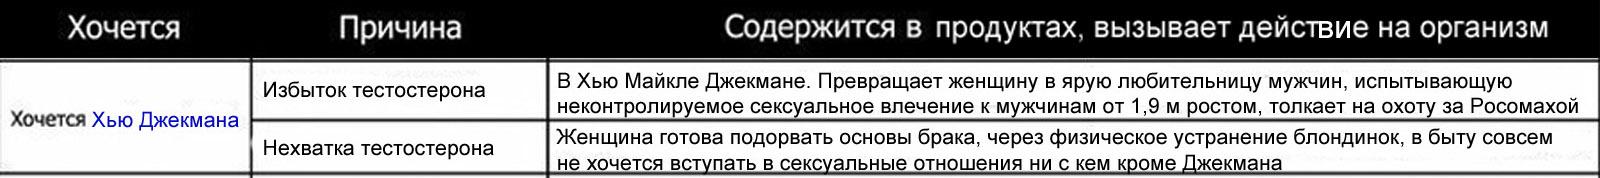 http://s5.uploads.ru/lMnUh.jpg